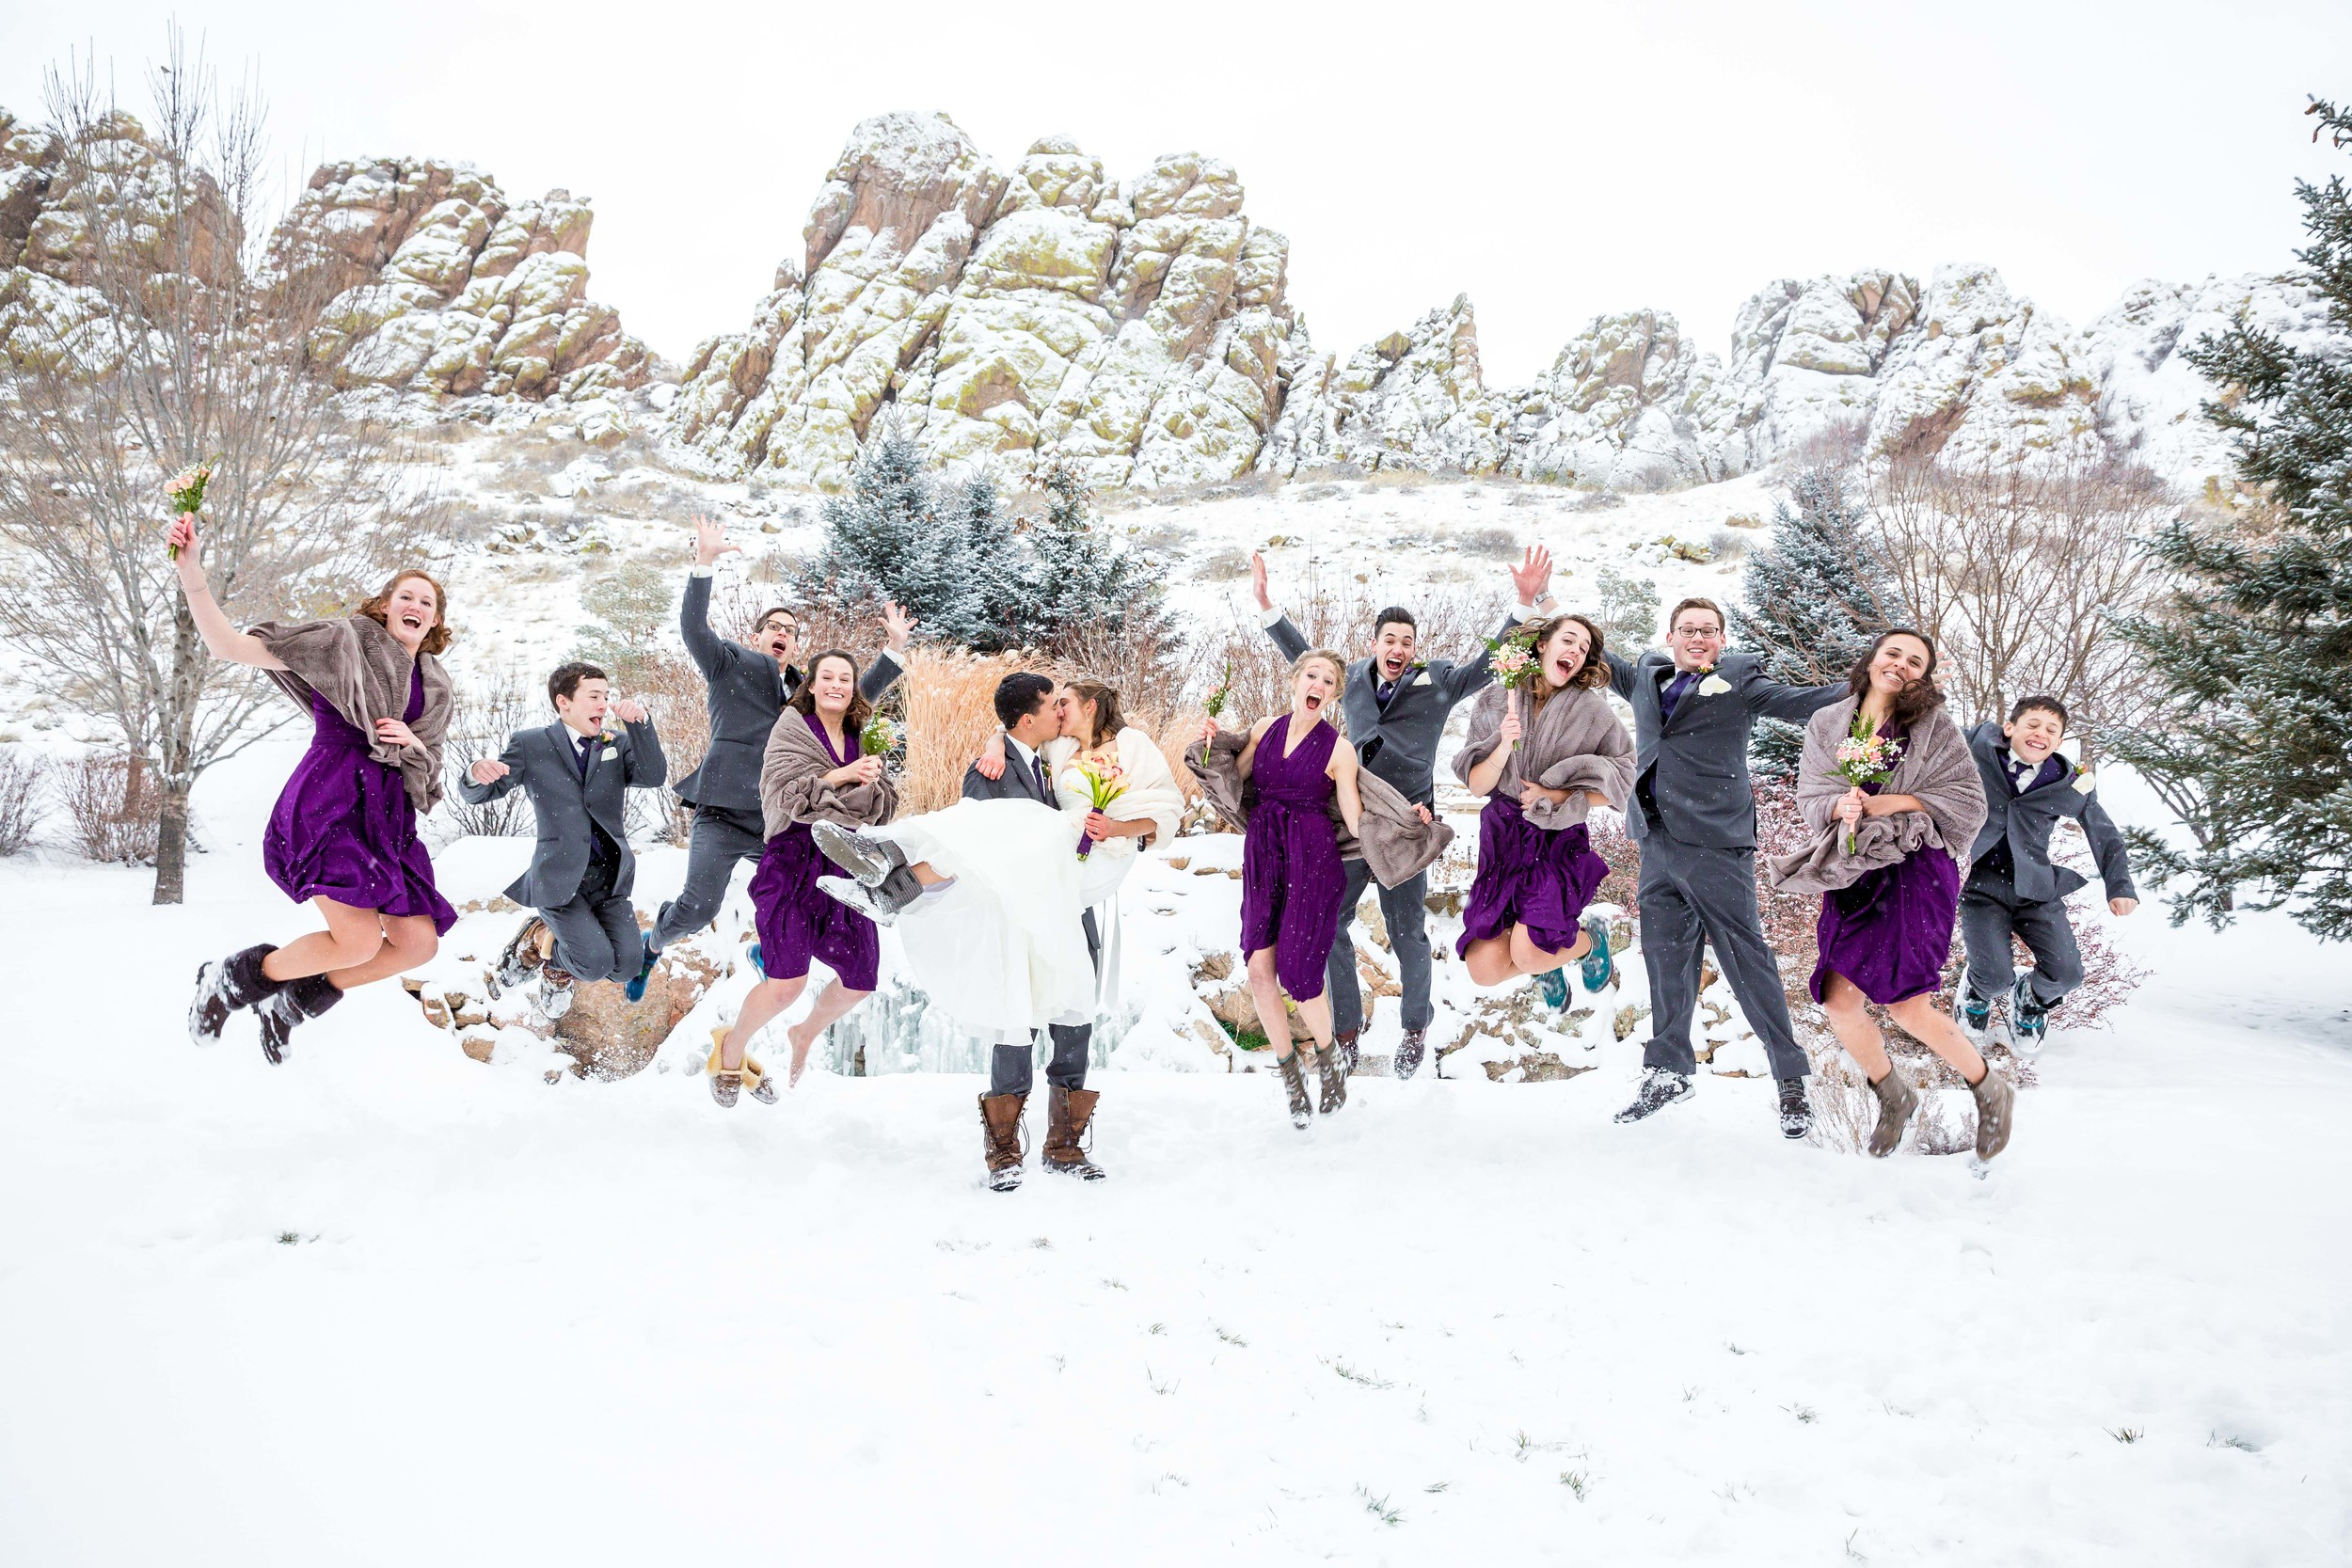 201500103_Estes Park Wedding Photographer_0091.jpg